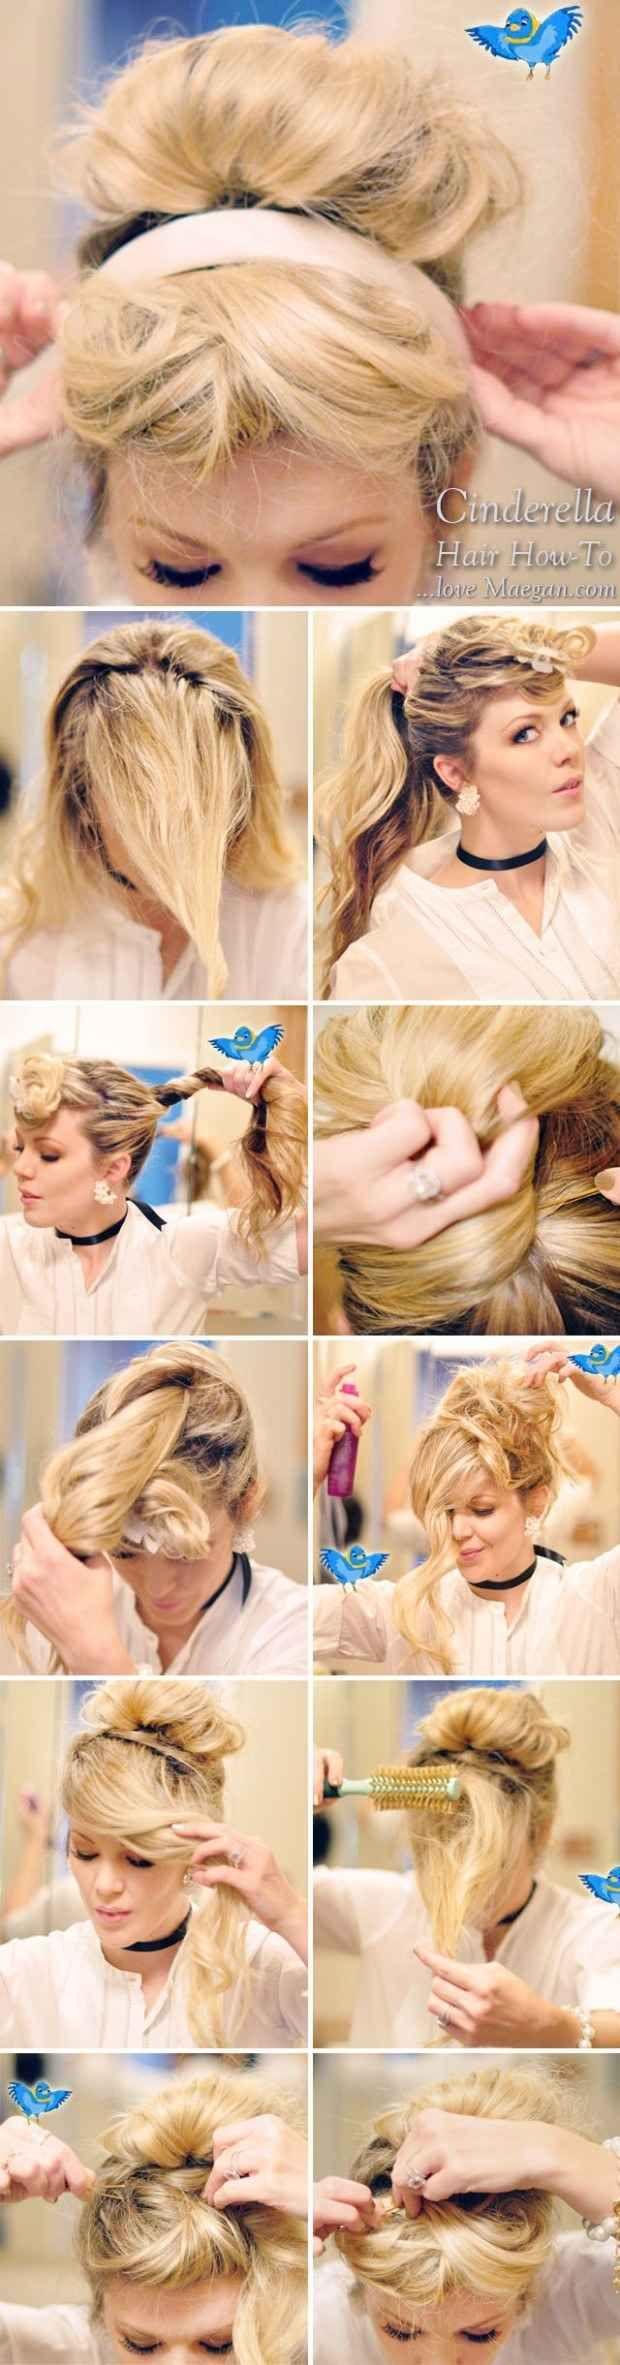 Easy How-To Disney Princess Hair